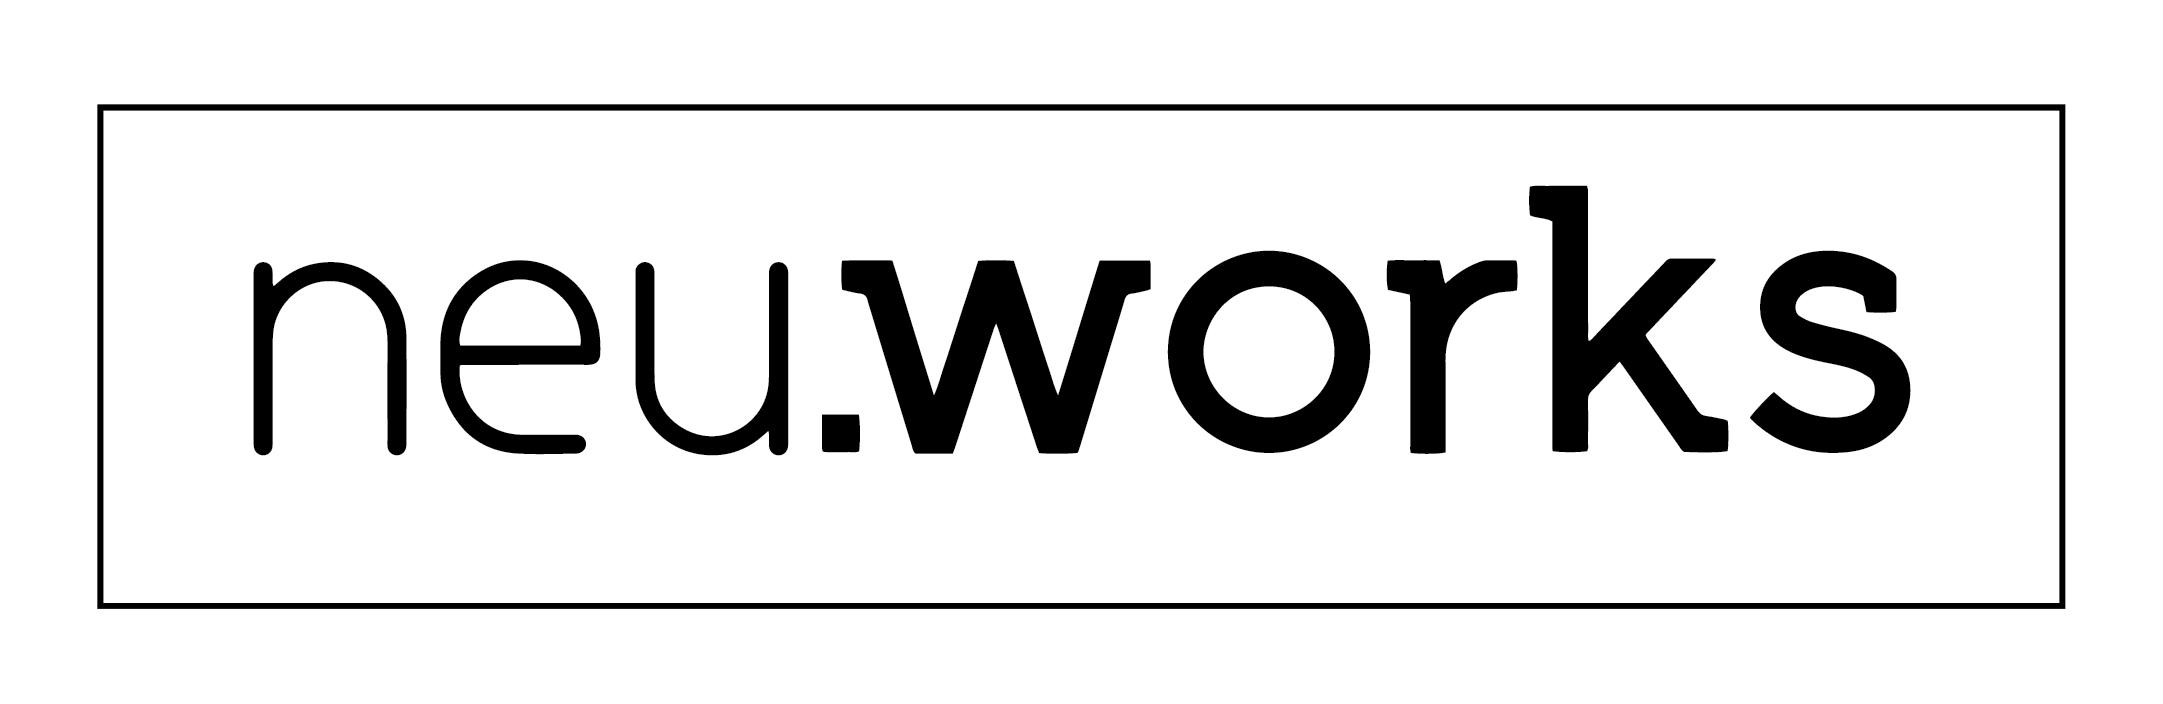 neu.works-logo-rectangle-white.png